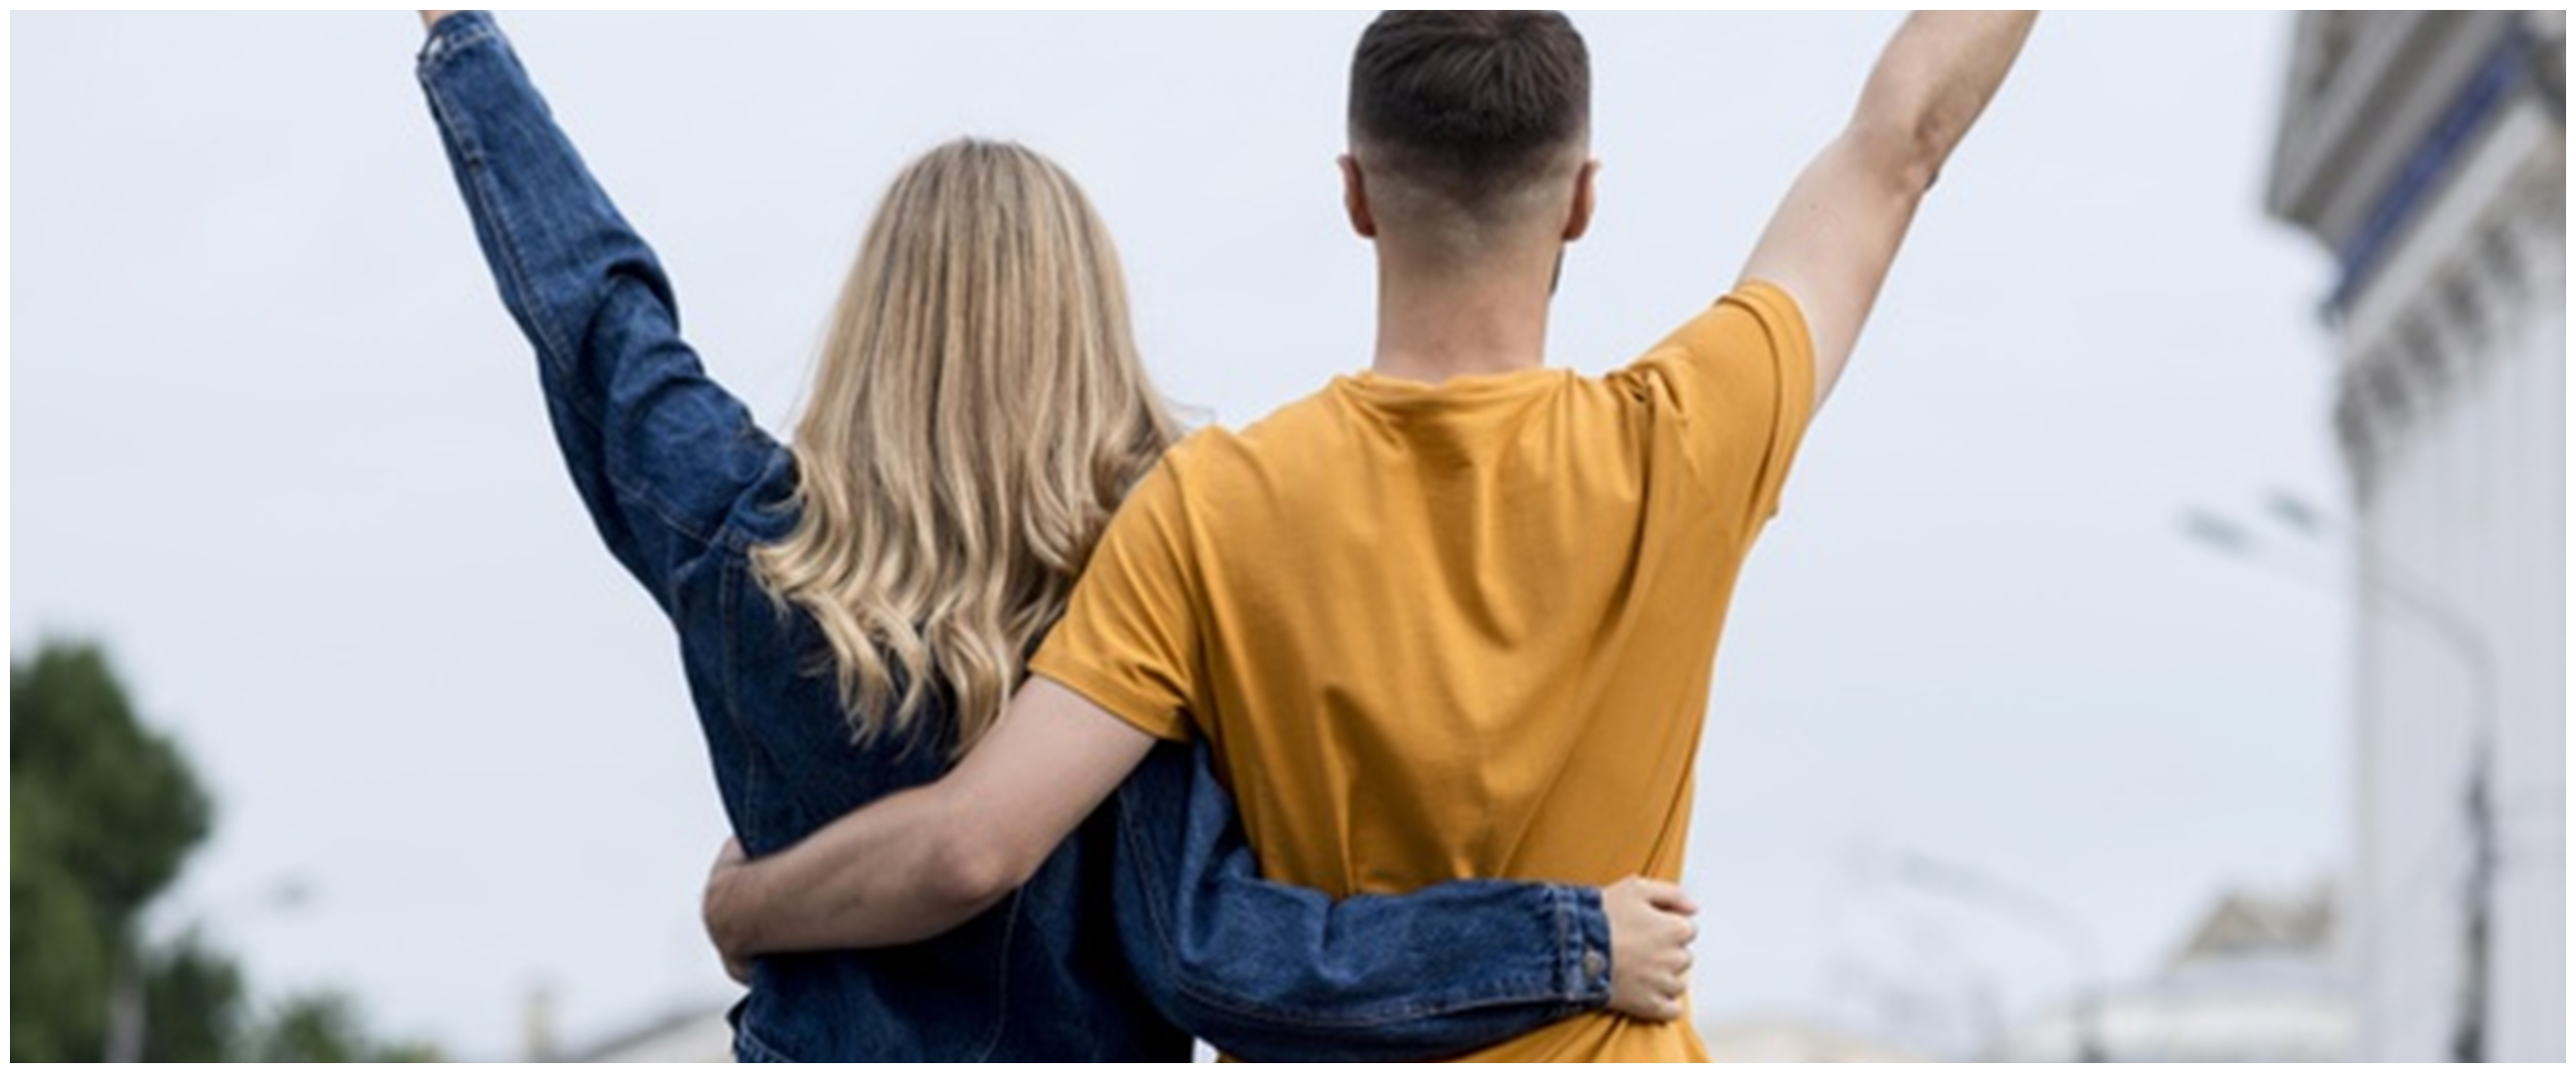 40 Kata-kata romantis tentang kenyamanan hubungan, bikin hati adem